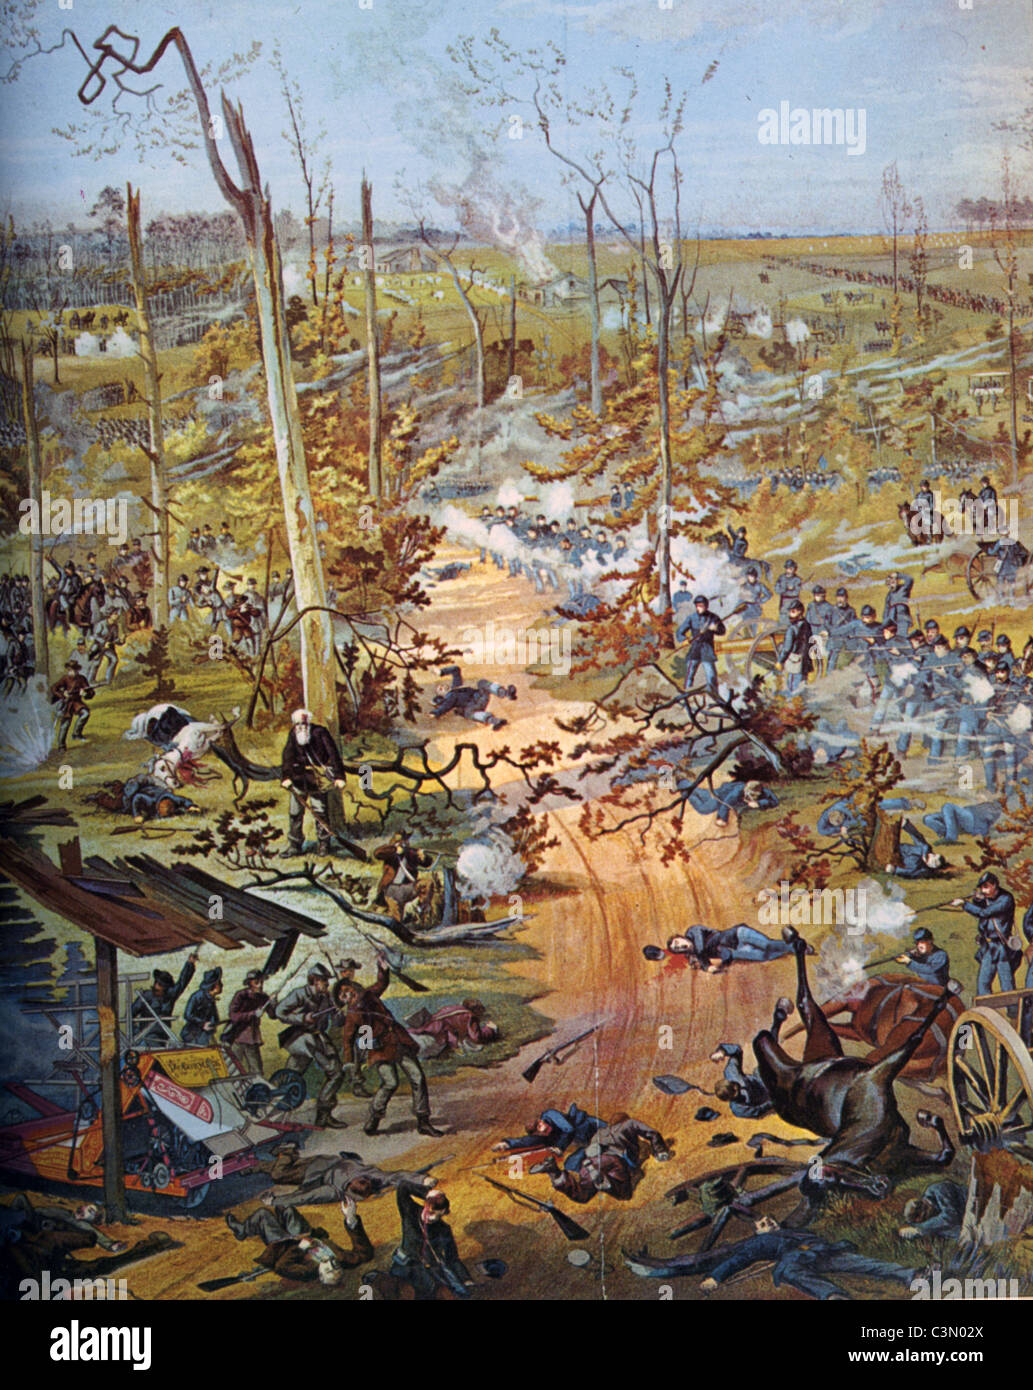 AMERICAN CIVIL WAR: BATTLE OF SHILOH  6-7 April 1862 - Stock Image